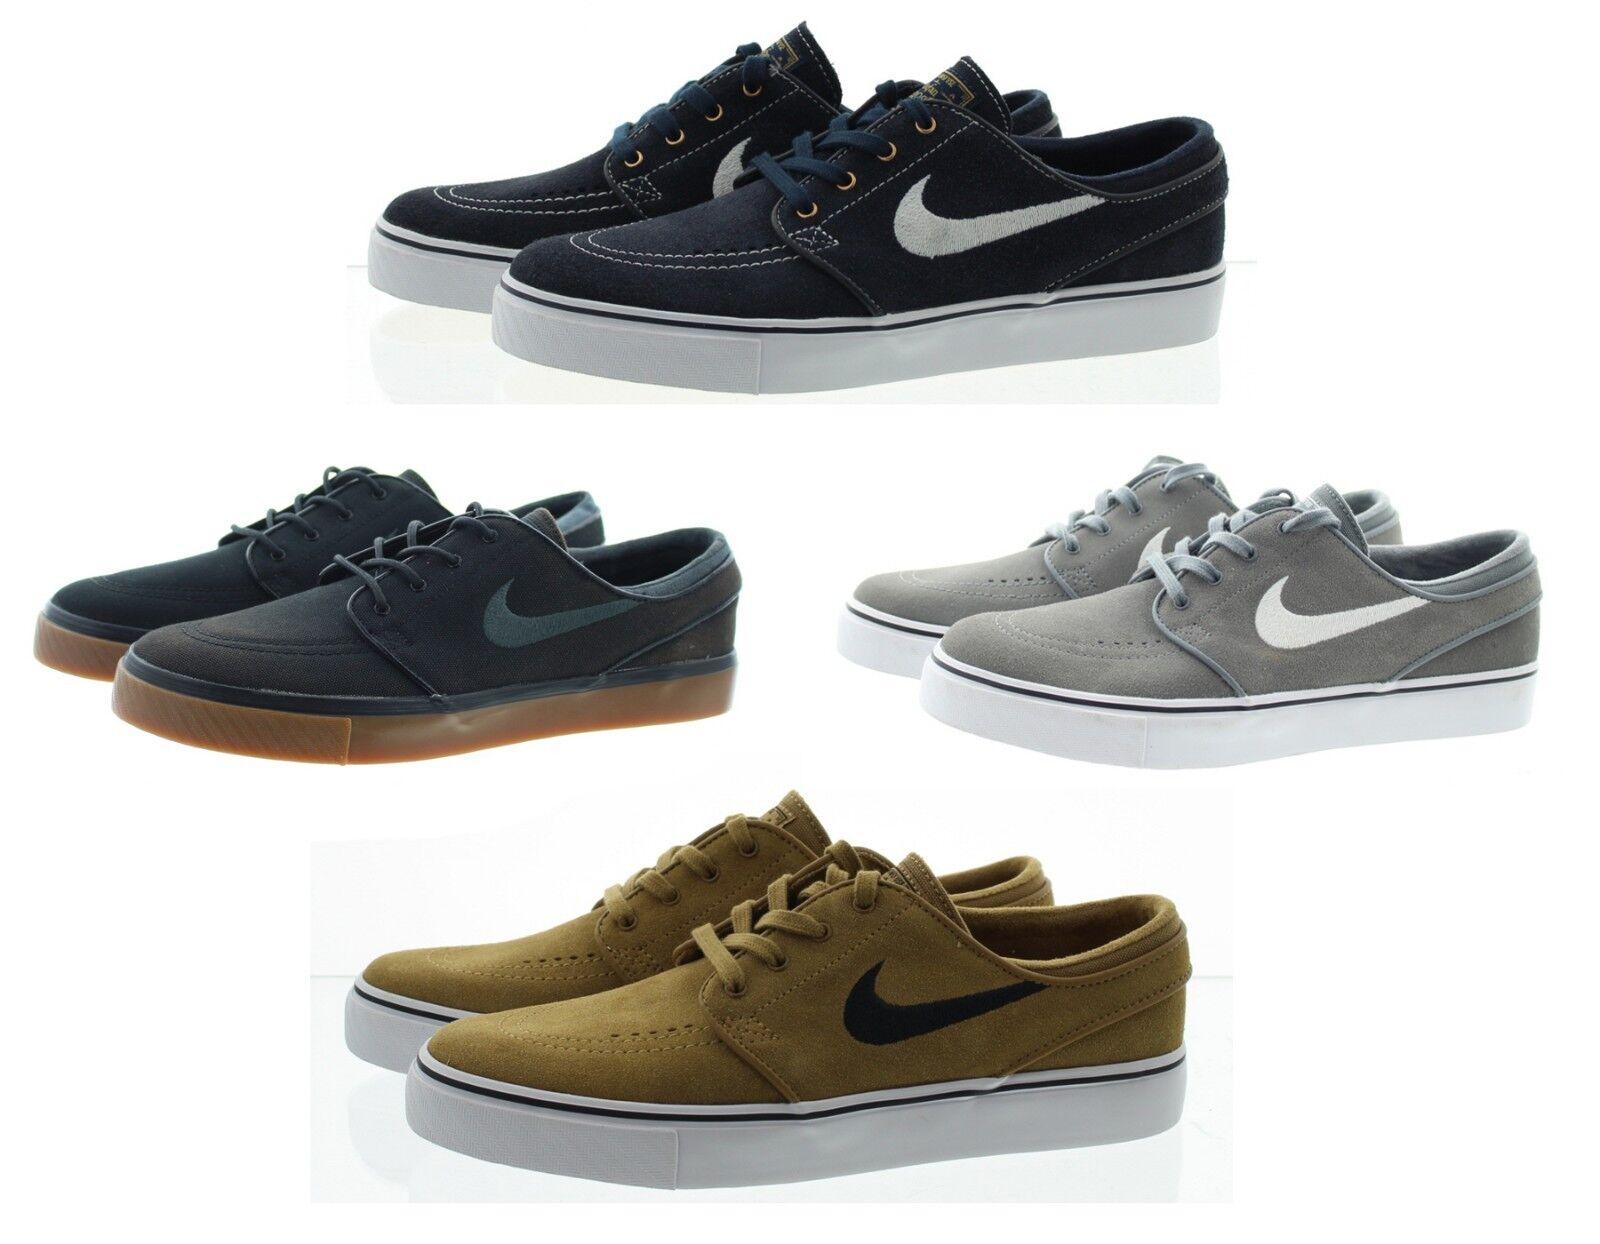 uk availability f53db 239b4 Faible 333824 À Nike Janoski Chaussures Zoom Haut Stefan Pq4wSH